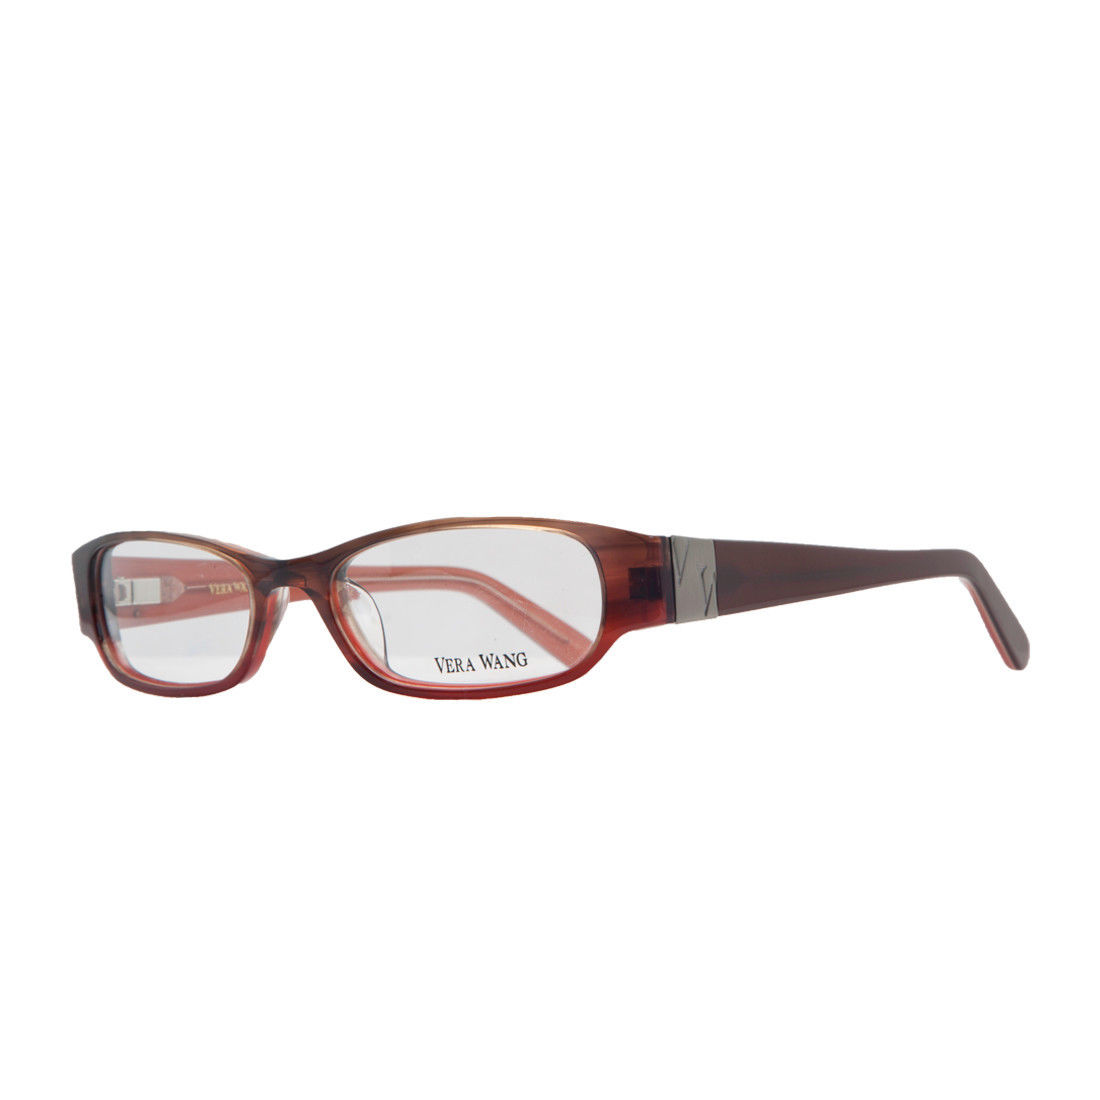 Vera Wang V 041 BU 50 Burgundy Full Rim Womens Optical Frame